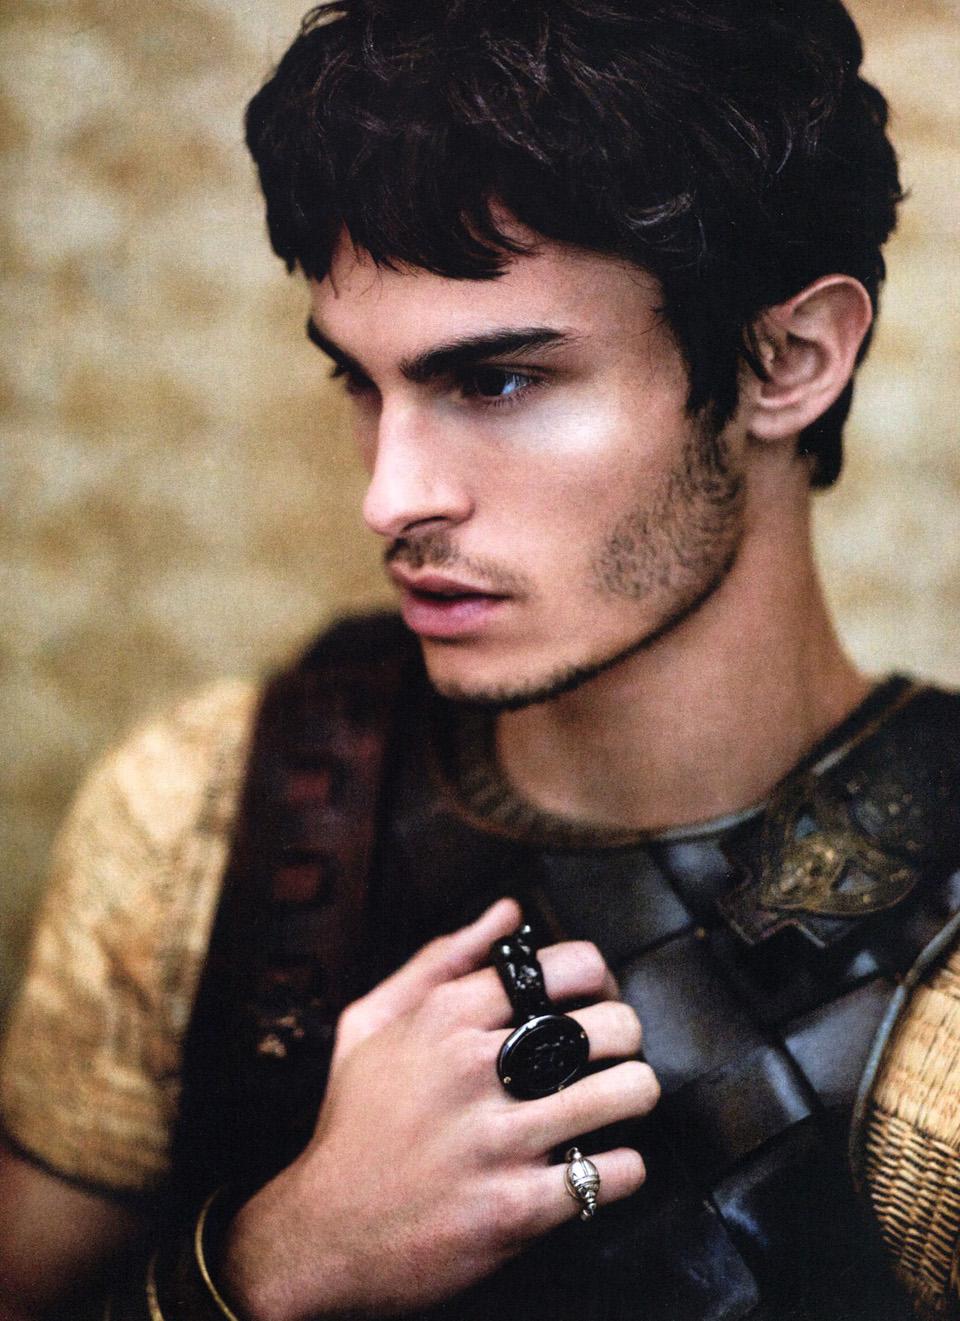 Baptiste Giabiconi #17